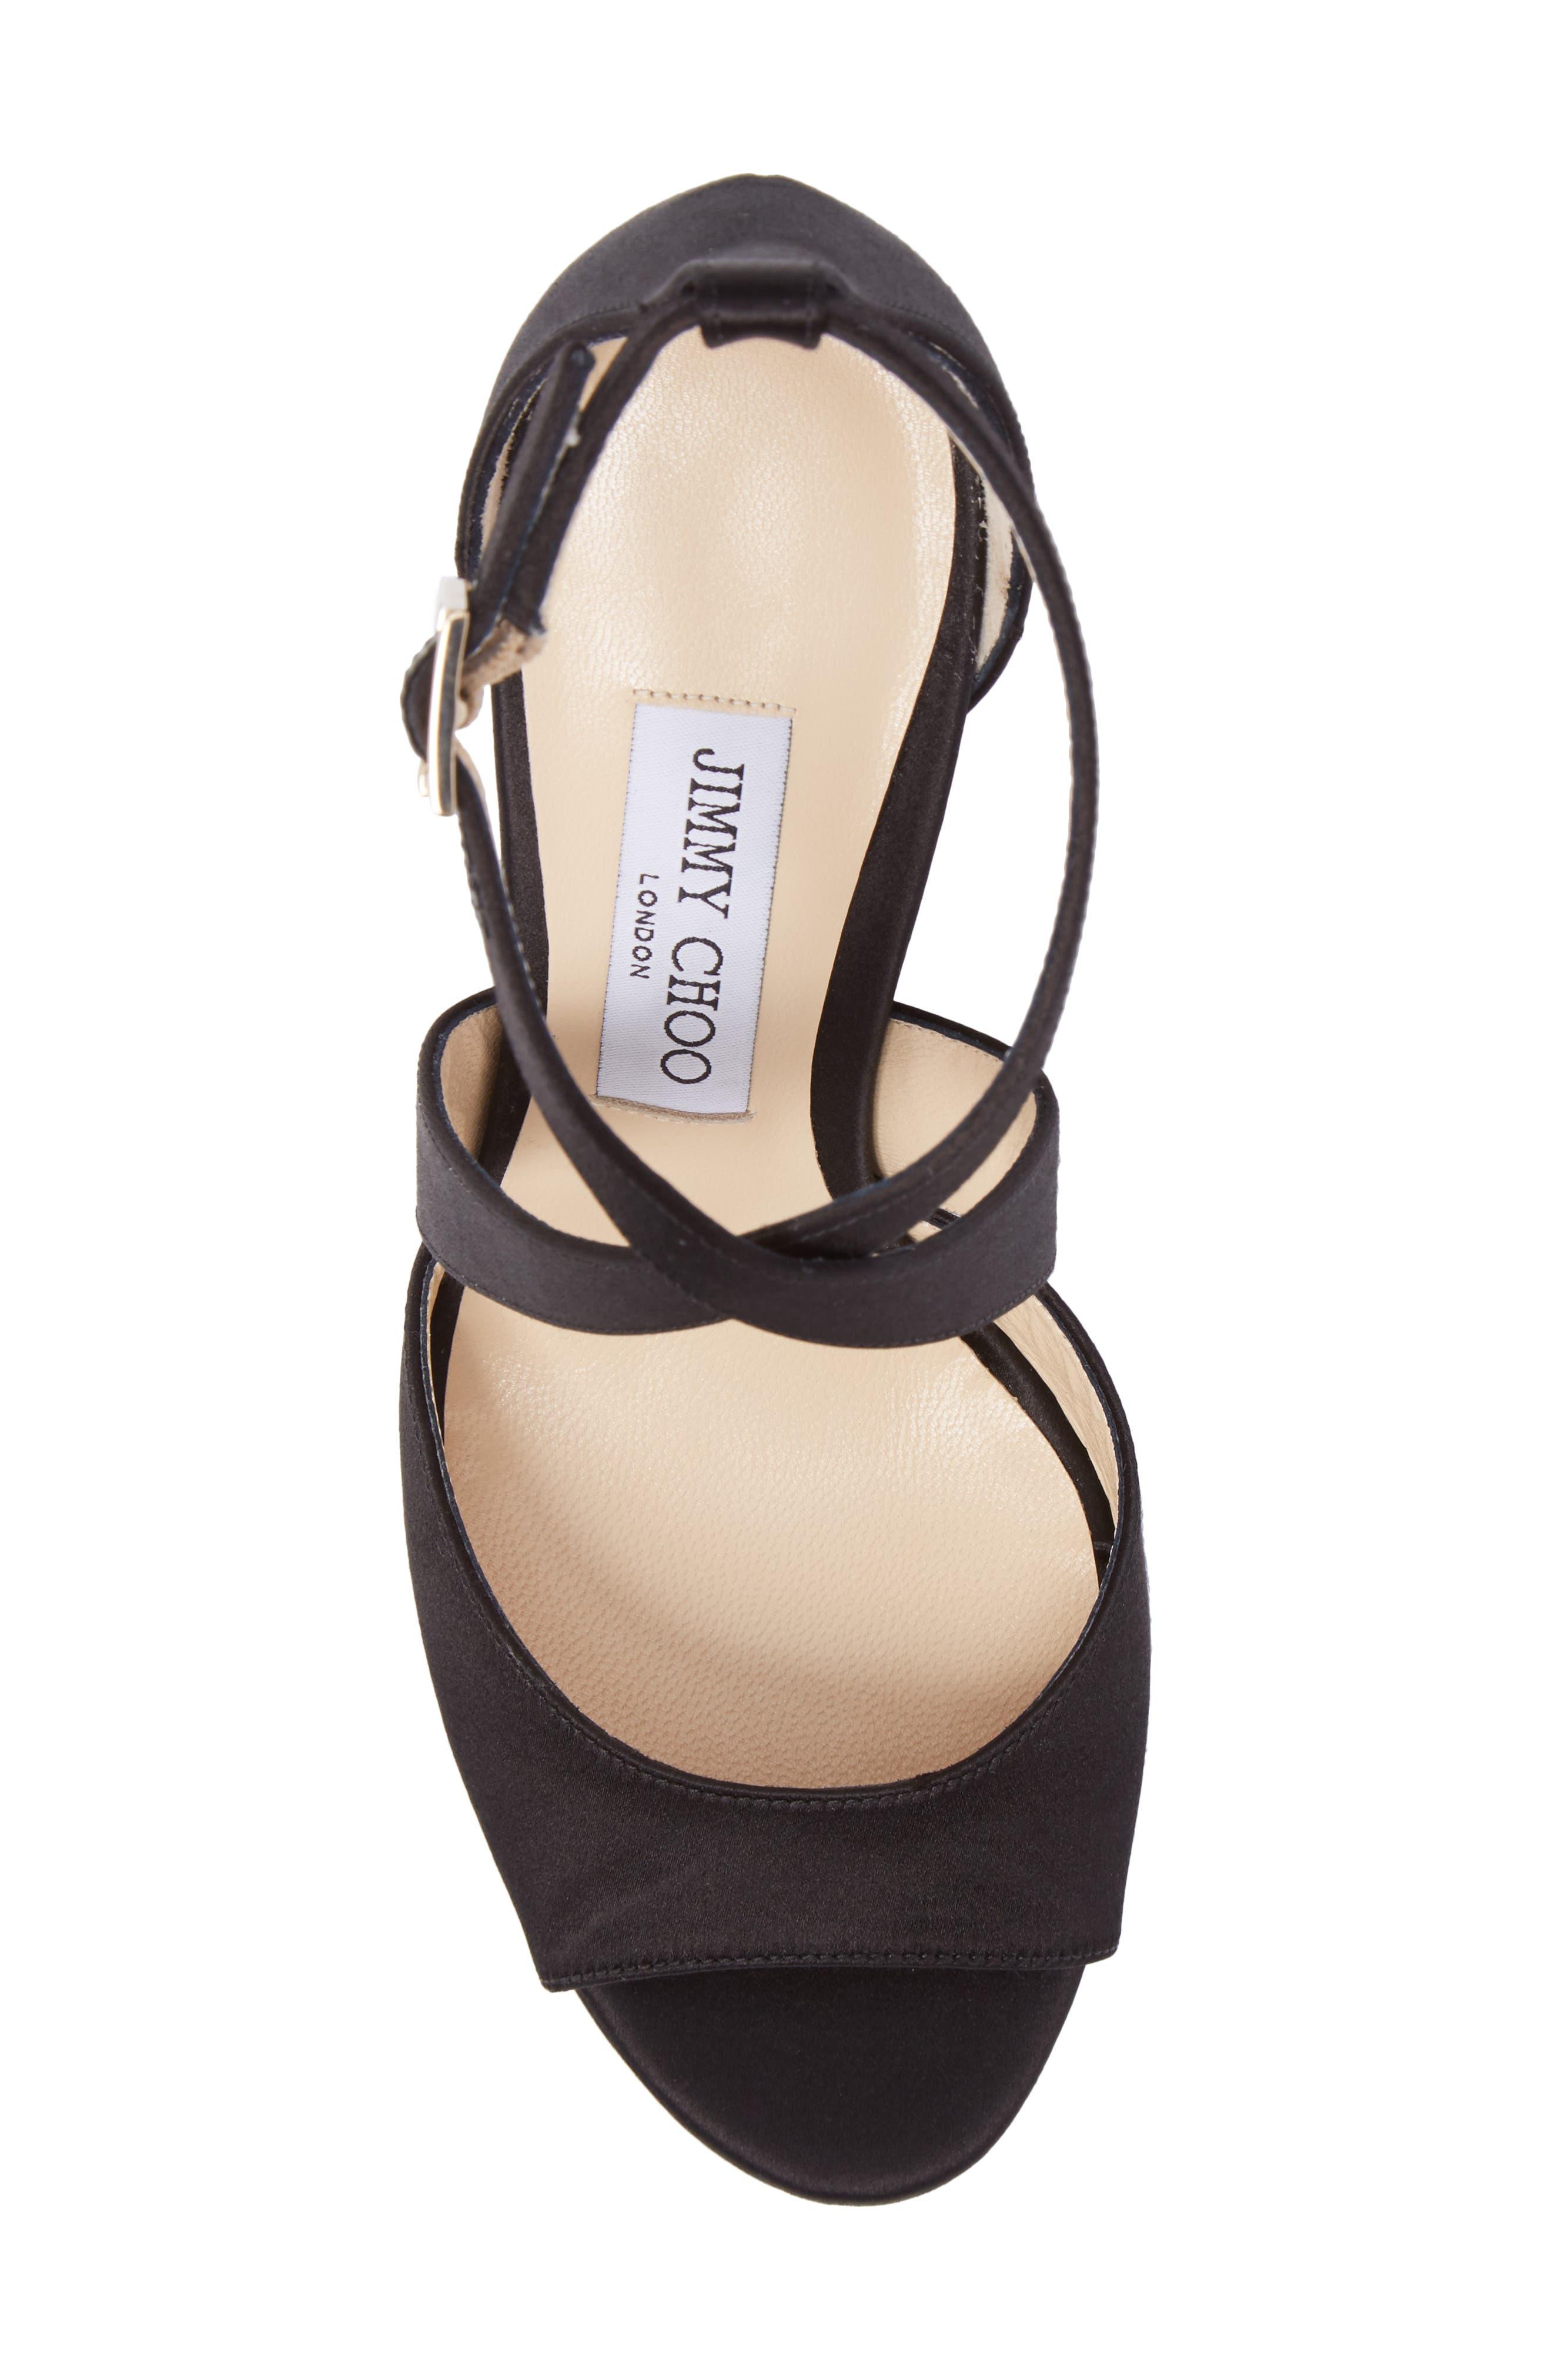 April Platform Sandal,                             Alternate thumbnail 5, color,                             Black/ Anthracite/ Black